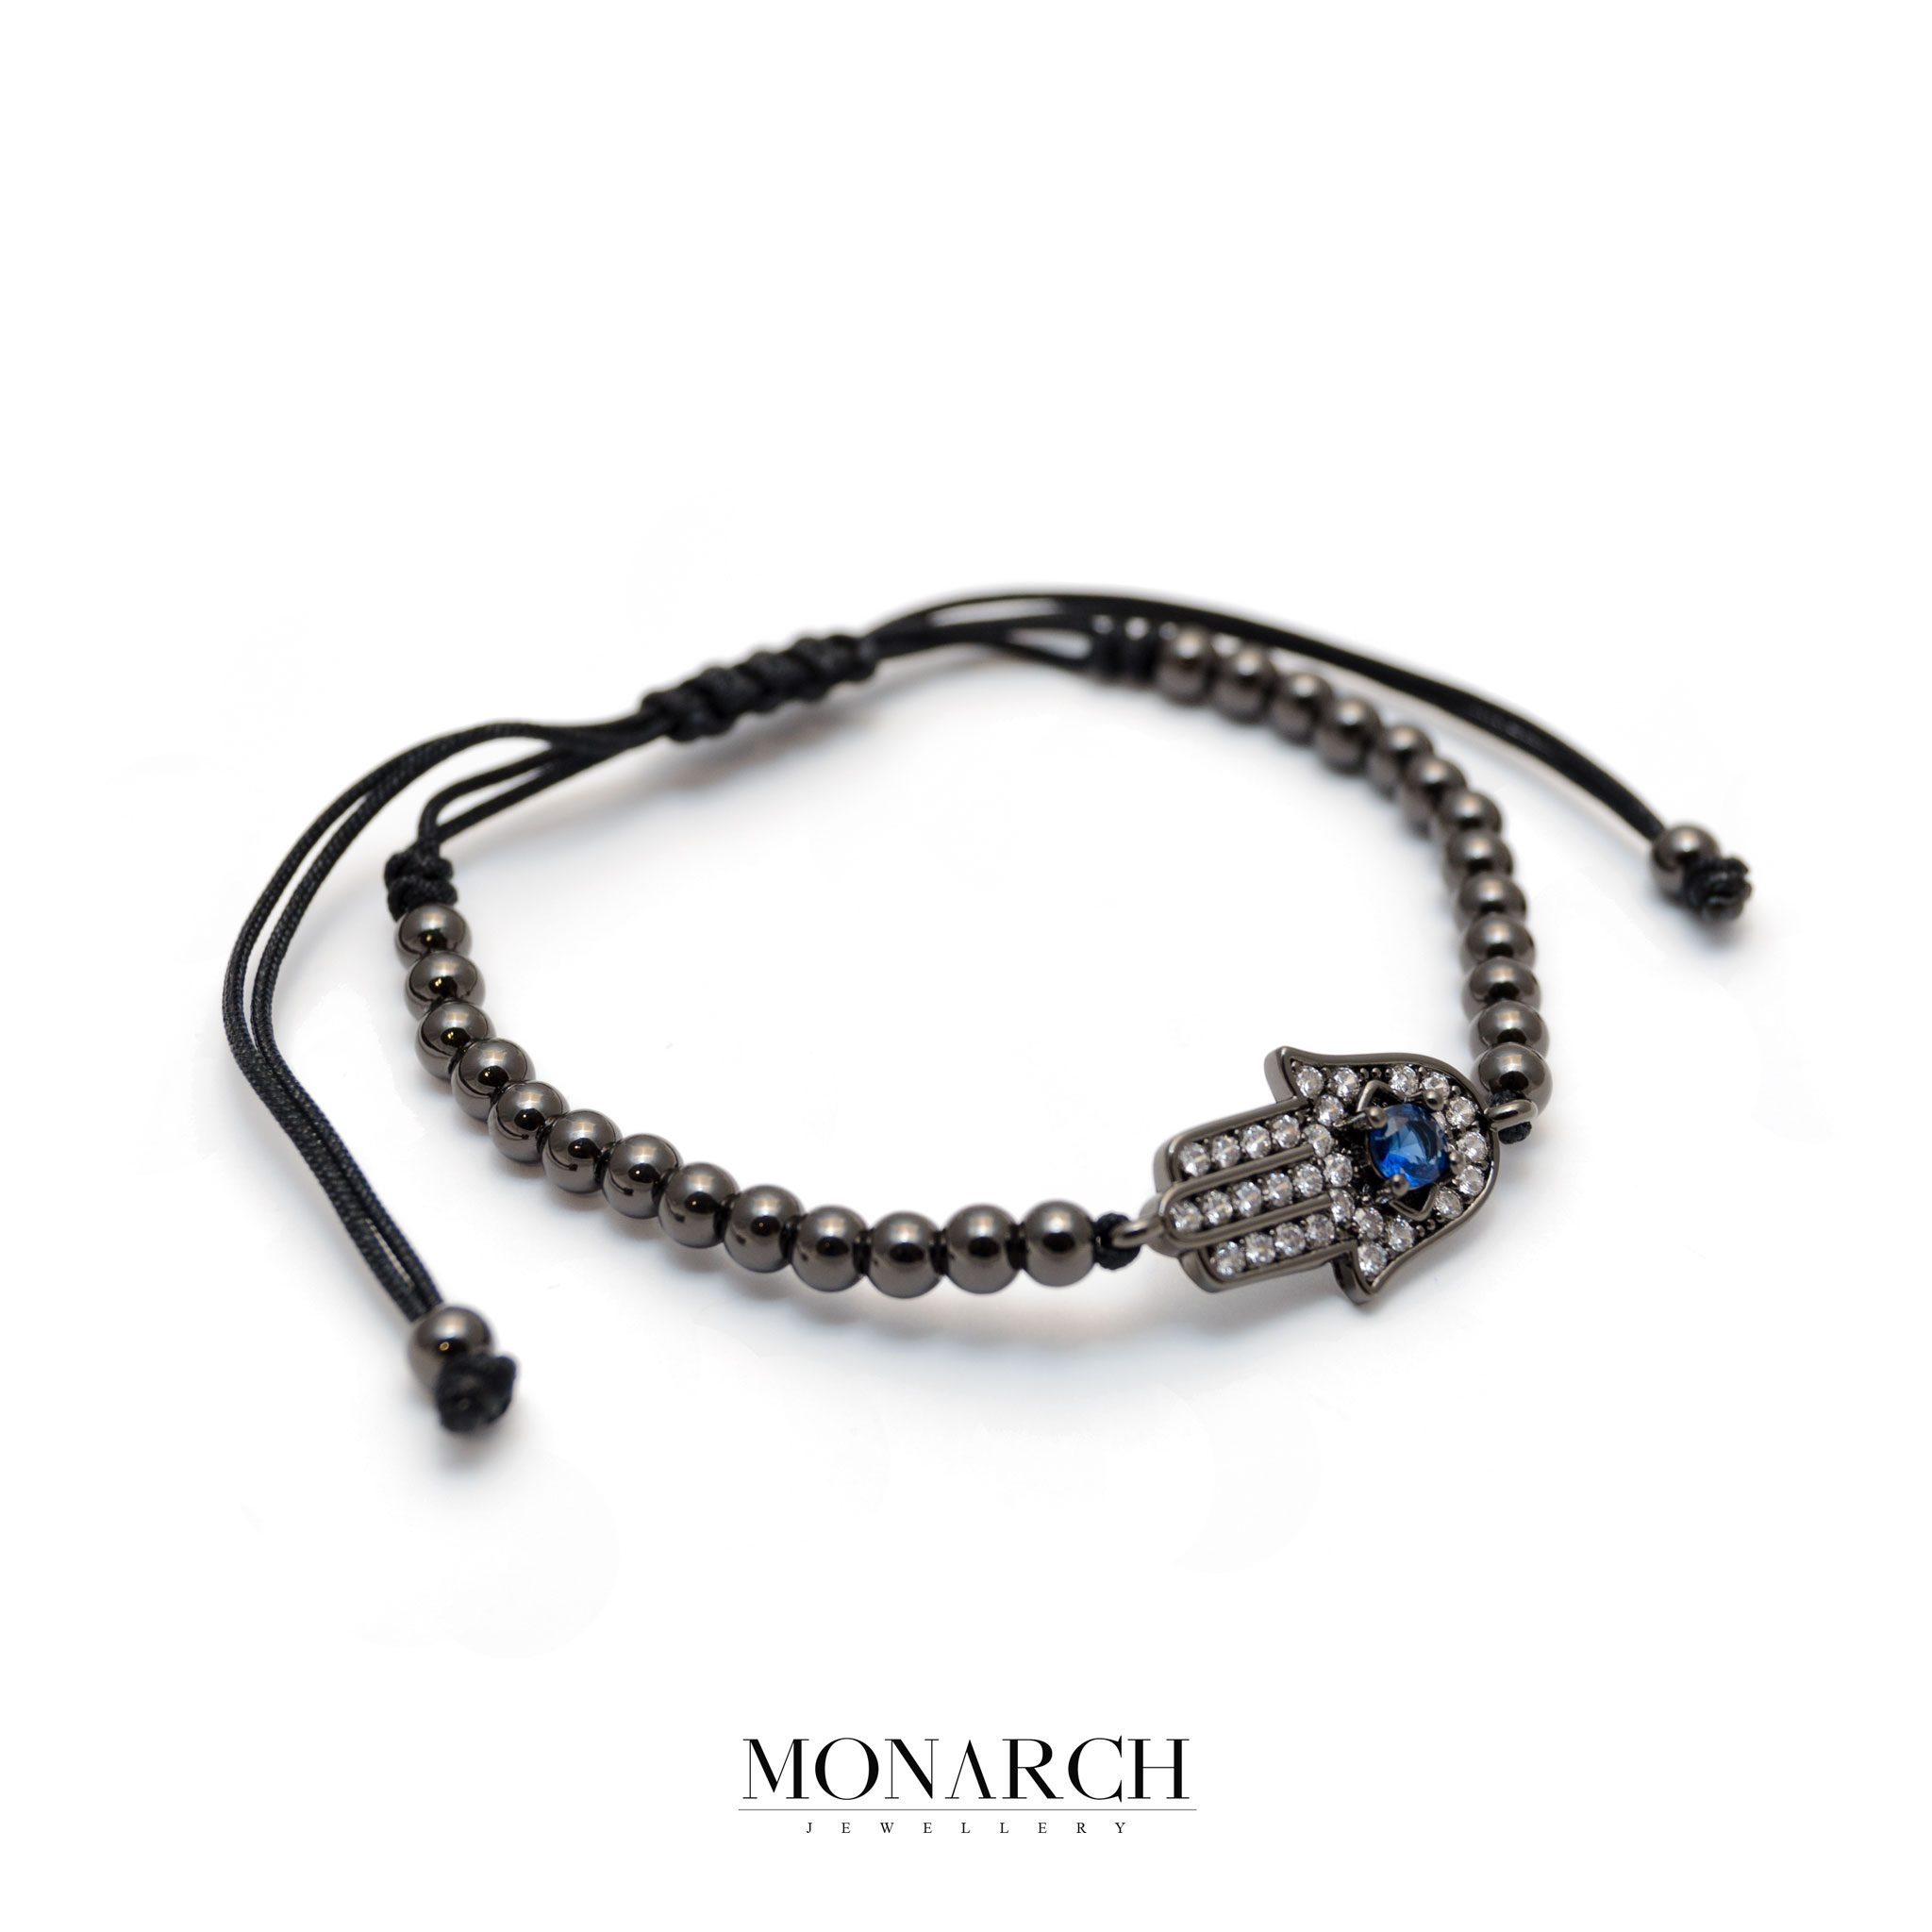 Monarch Jewellery Black Fatima Hand Charm Macrame Bracelet